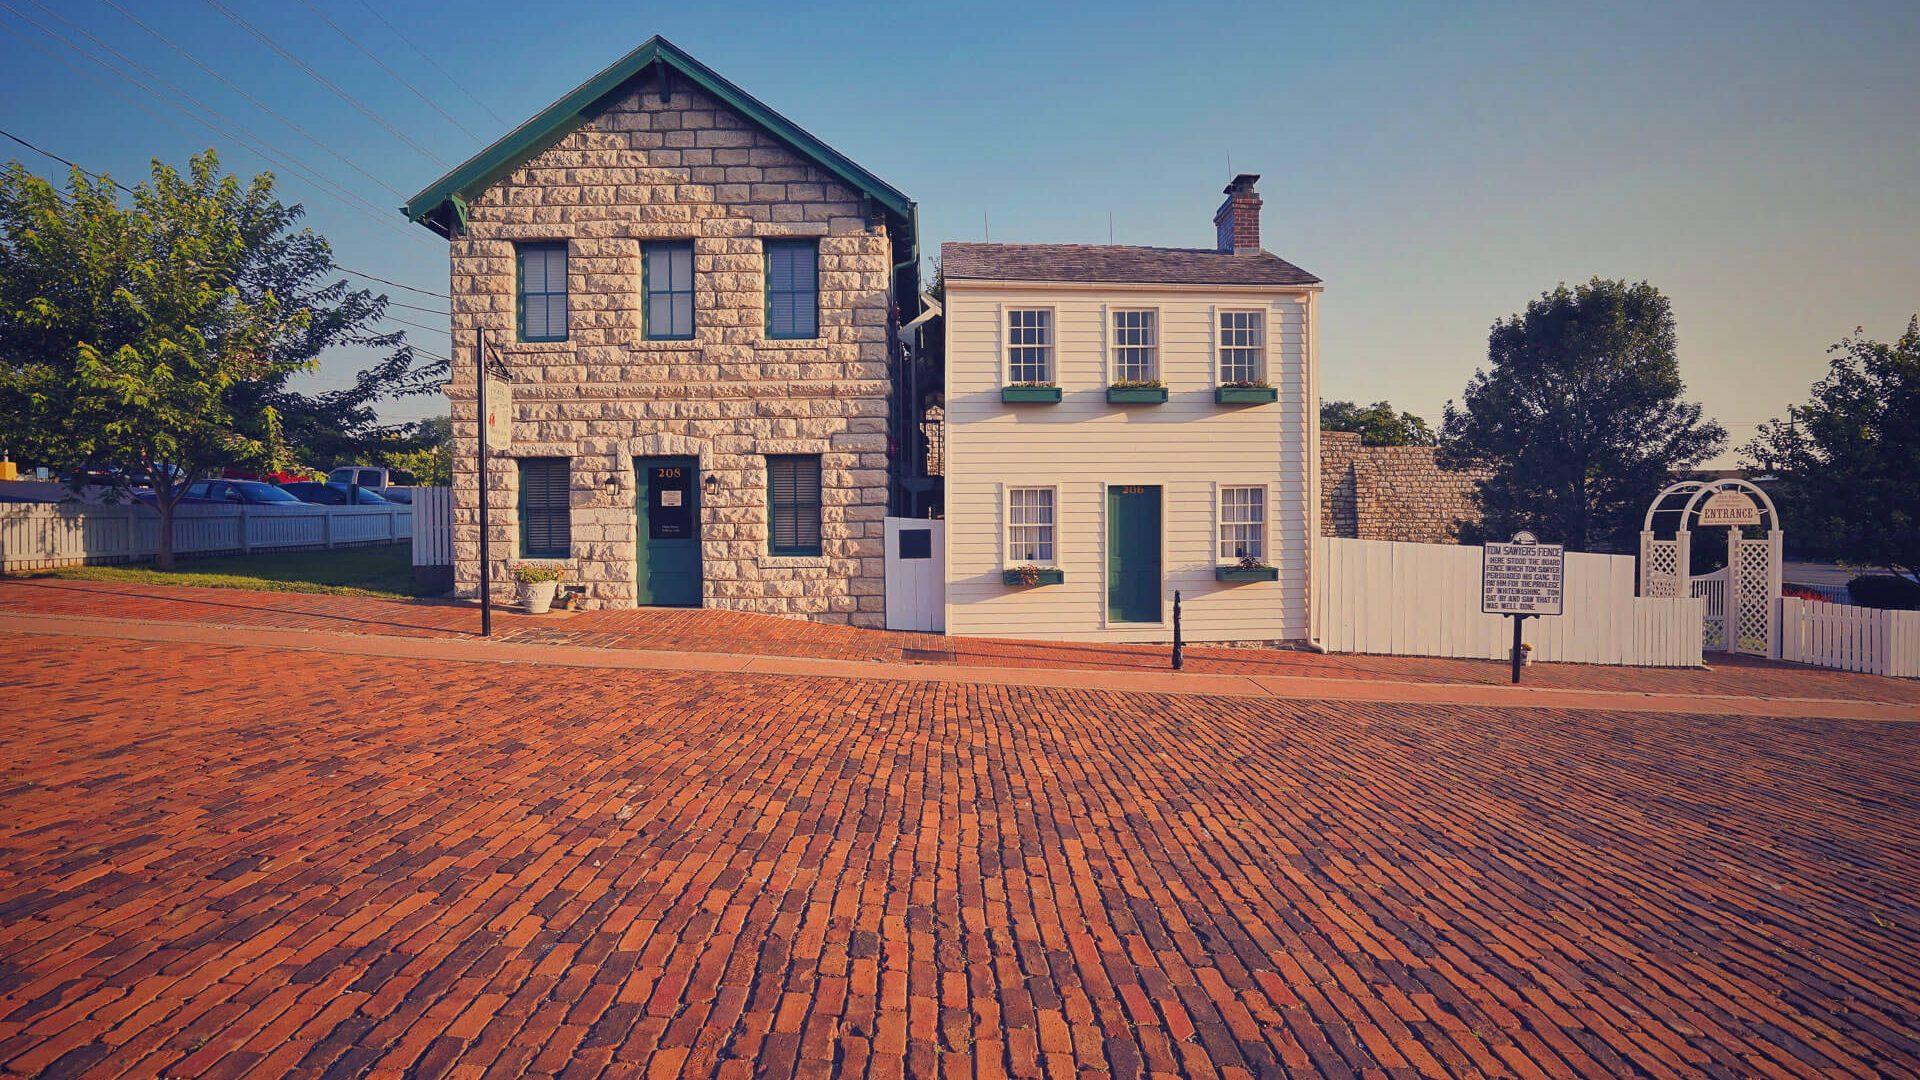 Mark Twain Boyhood Home and Museum in Hannibal, MO